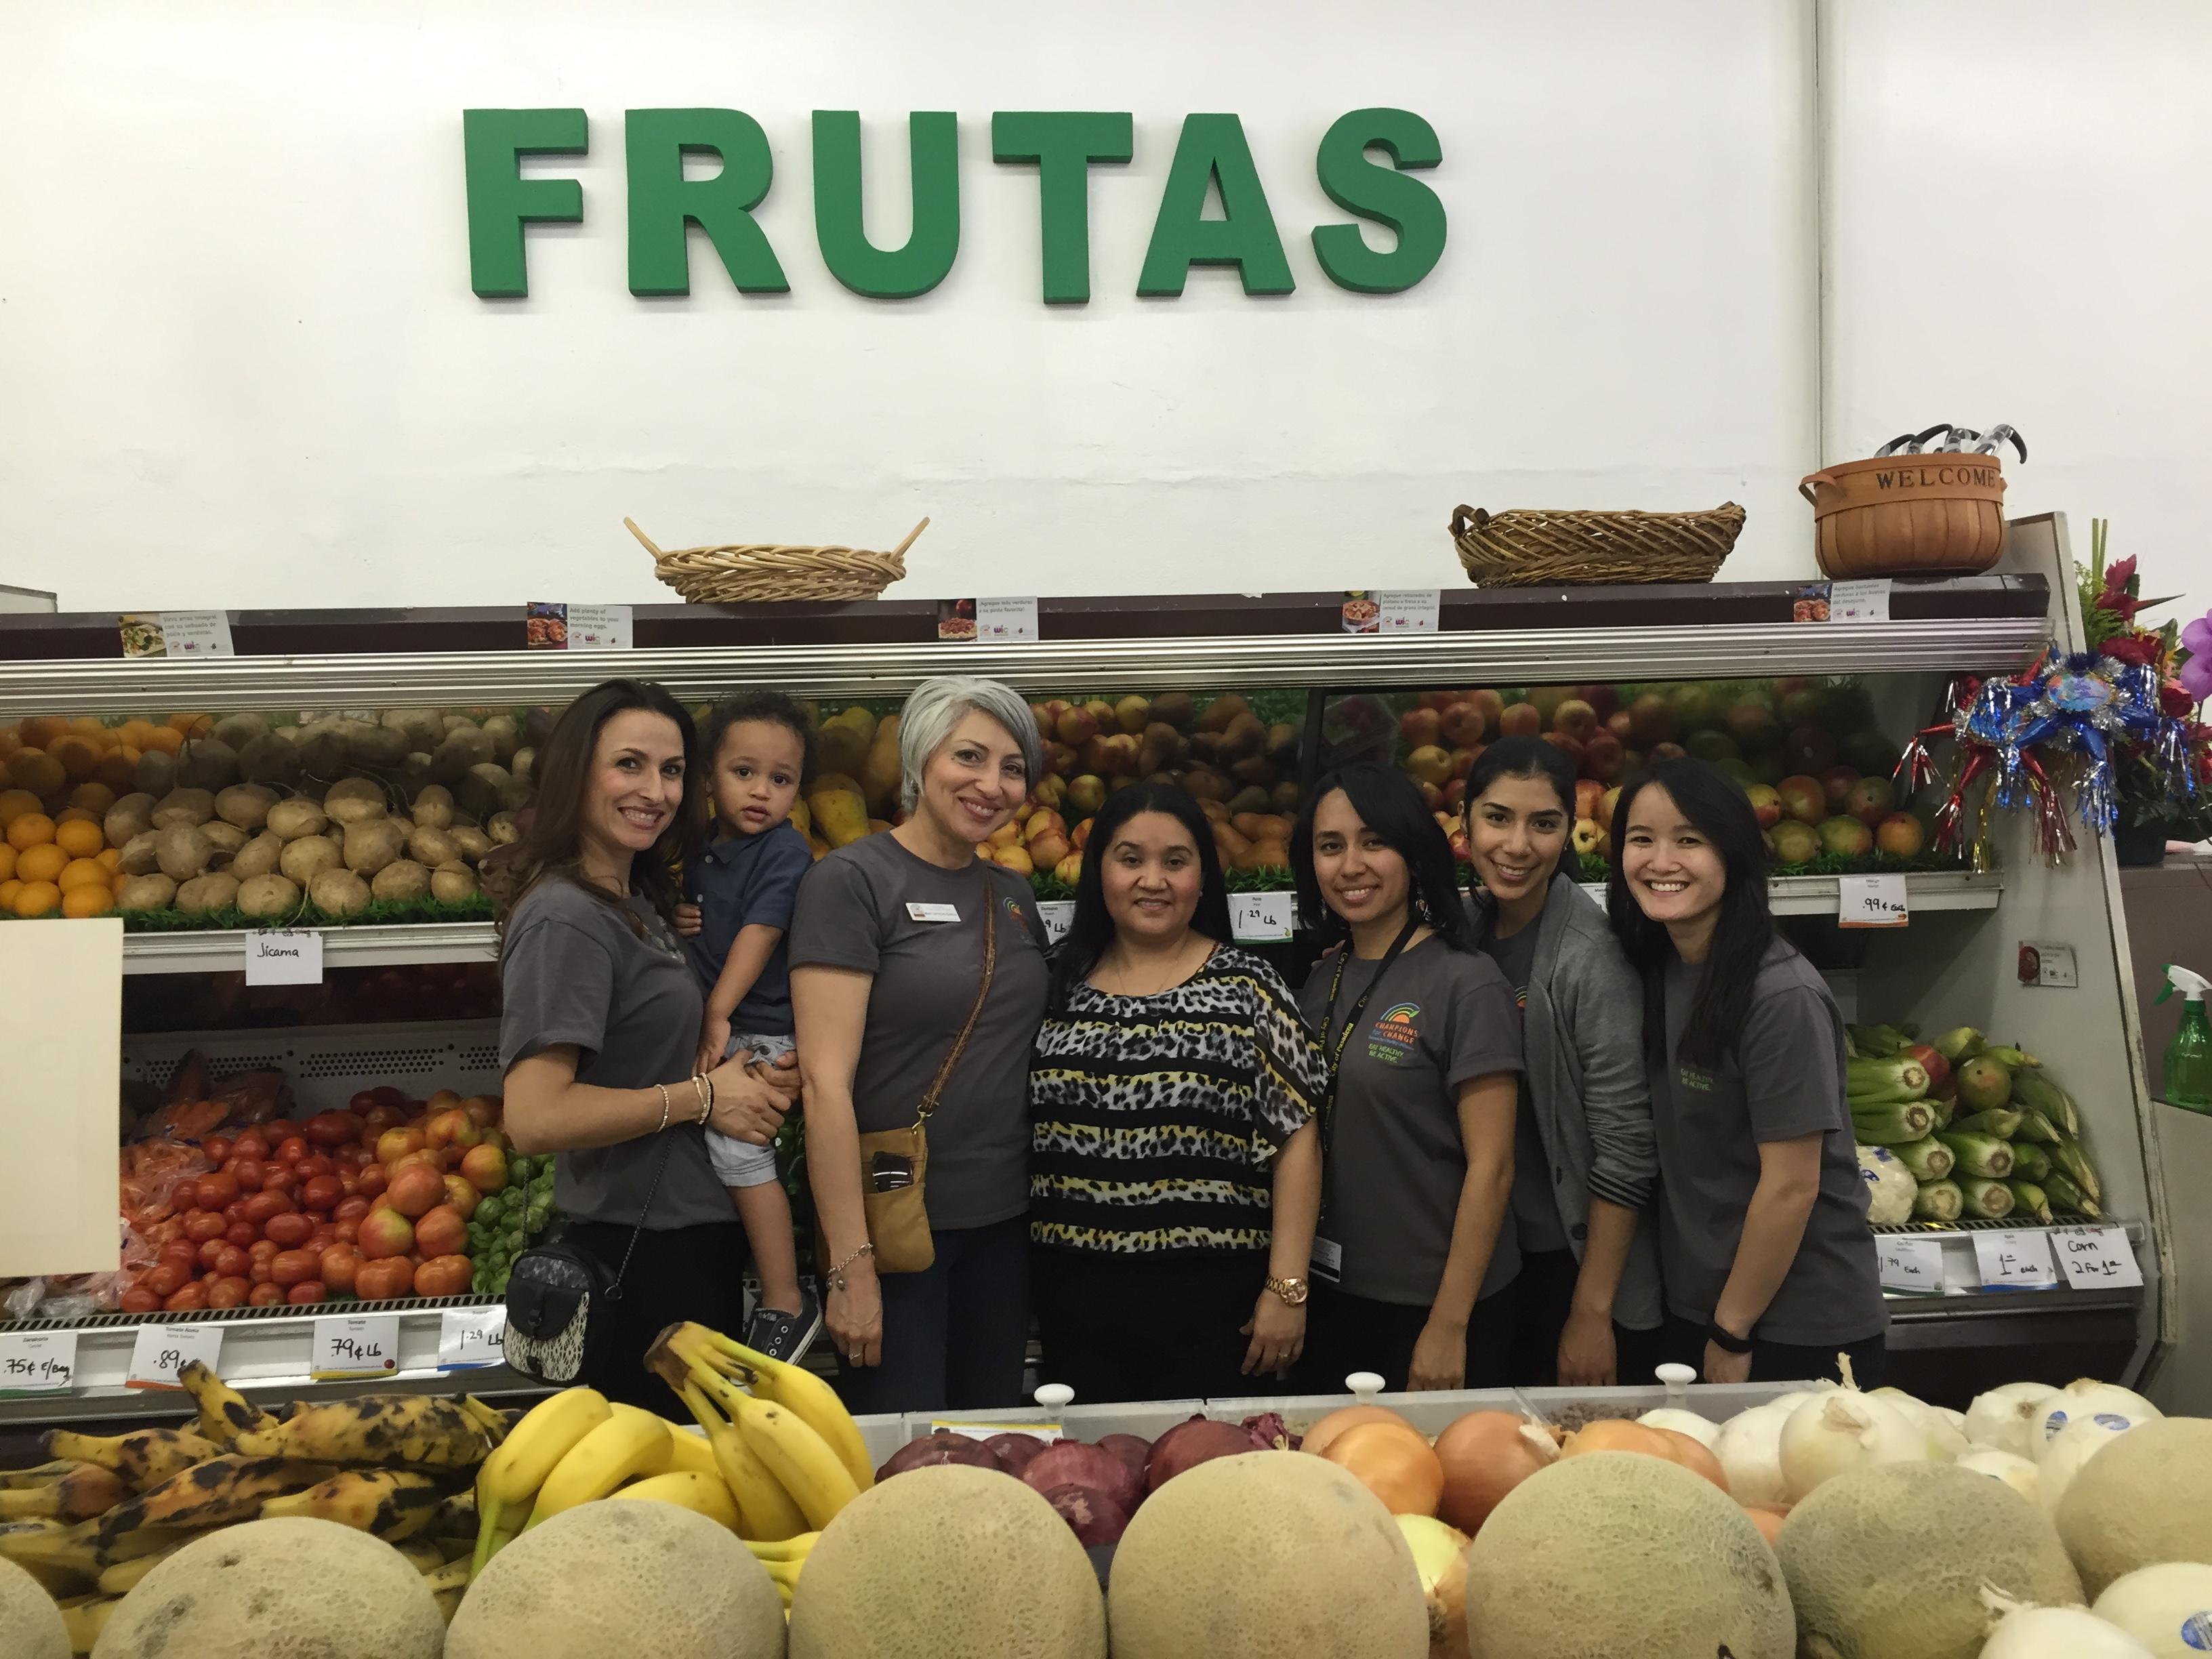 Women posing under Frutas sign